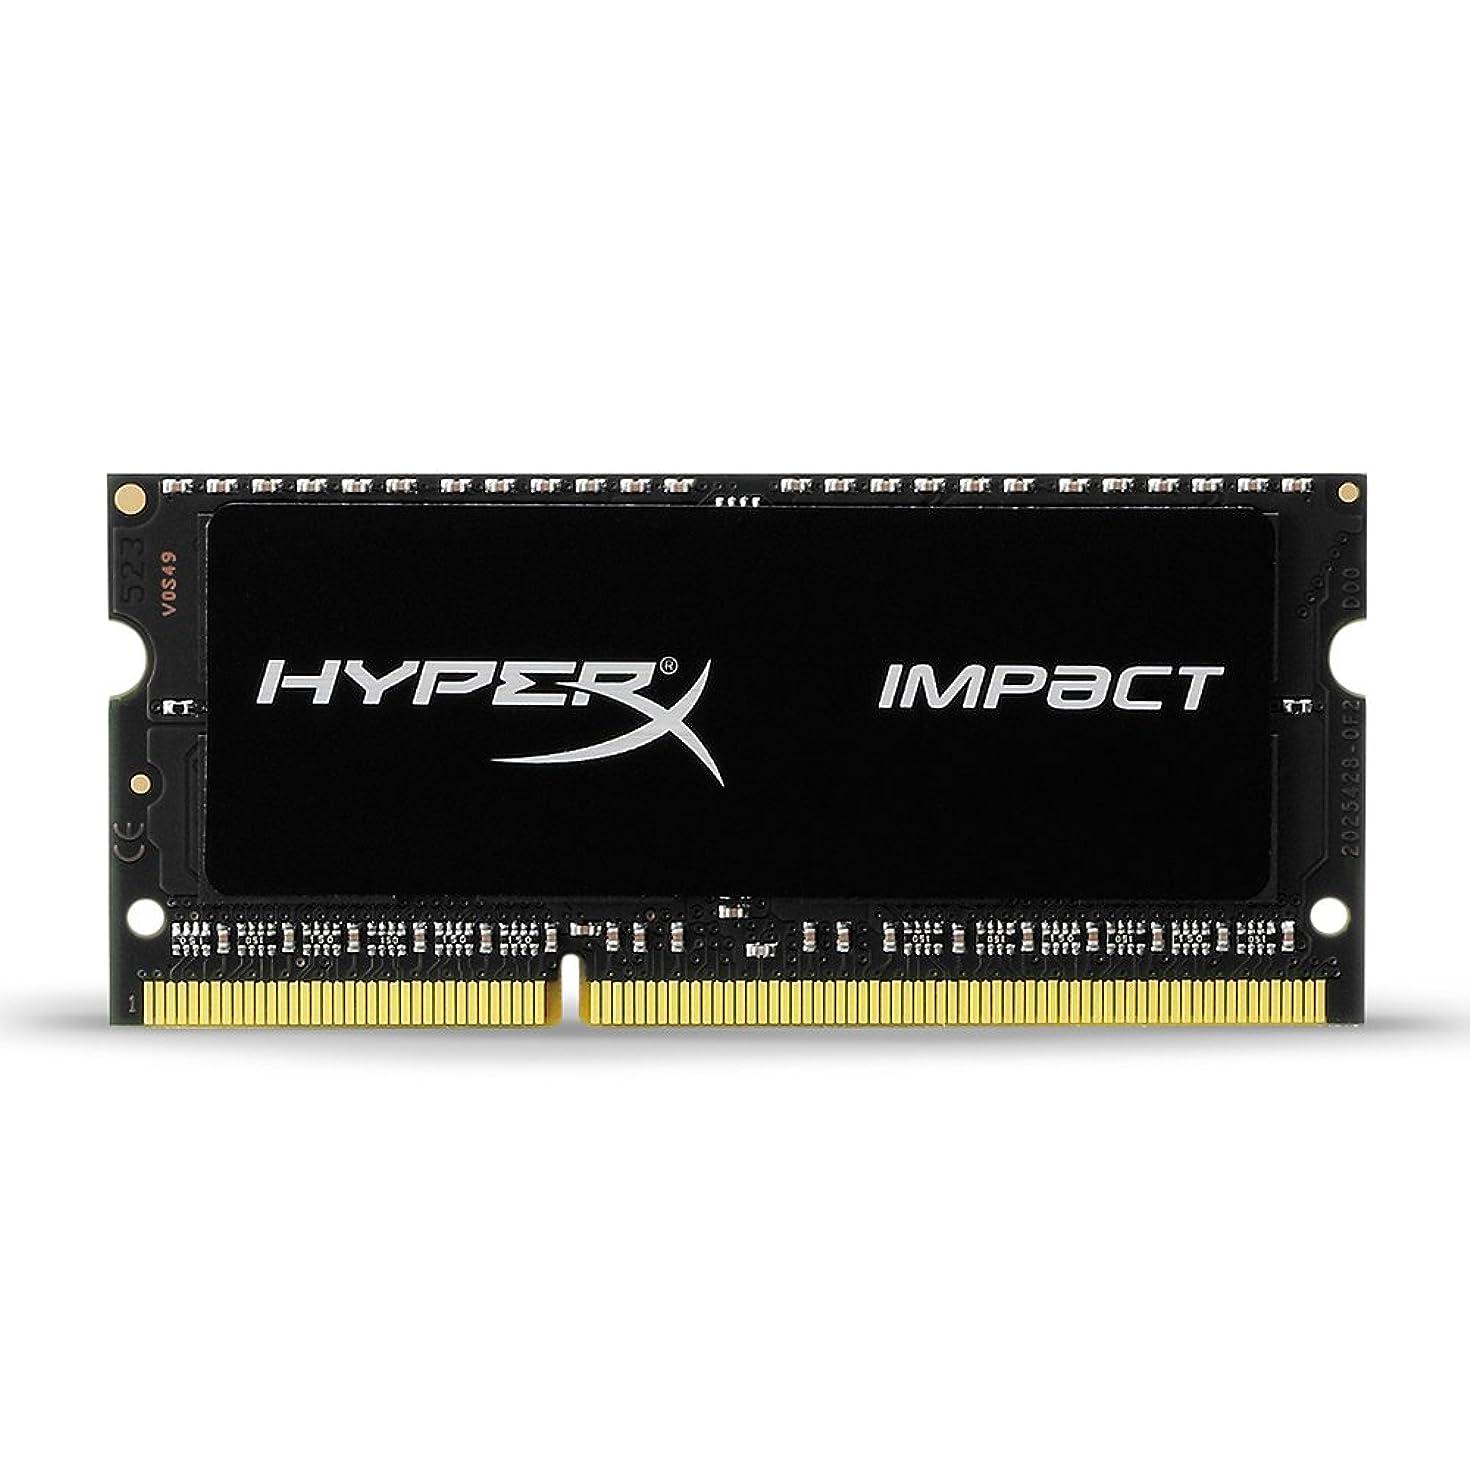 Kingston Technology HyperX Impact 8GB 1600MHz DDR3L CL9 SODIMM 1.35V Laptop Memory HX316LS9IB/8 Black